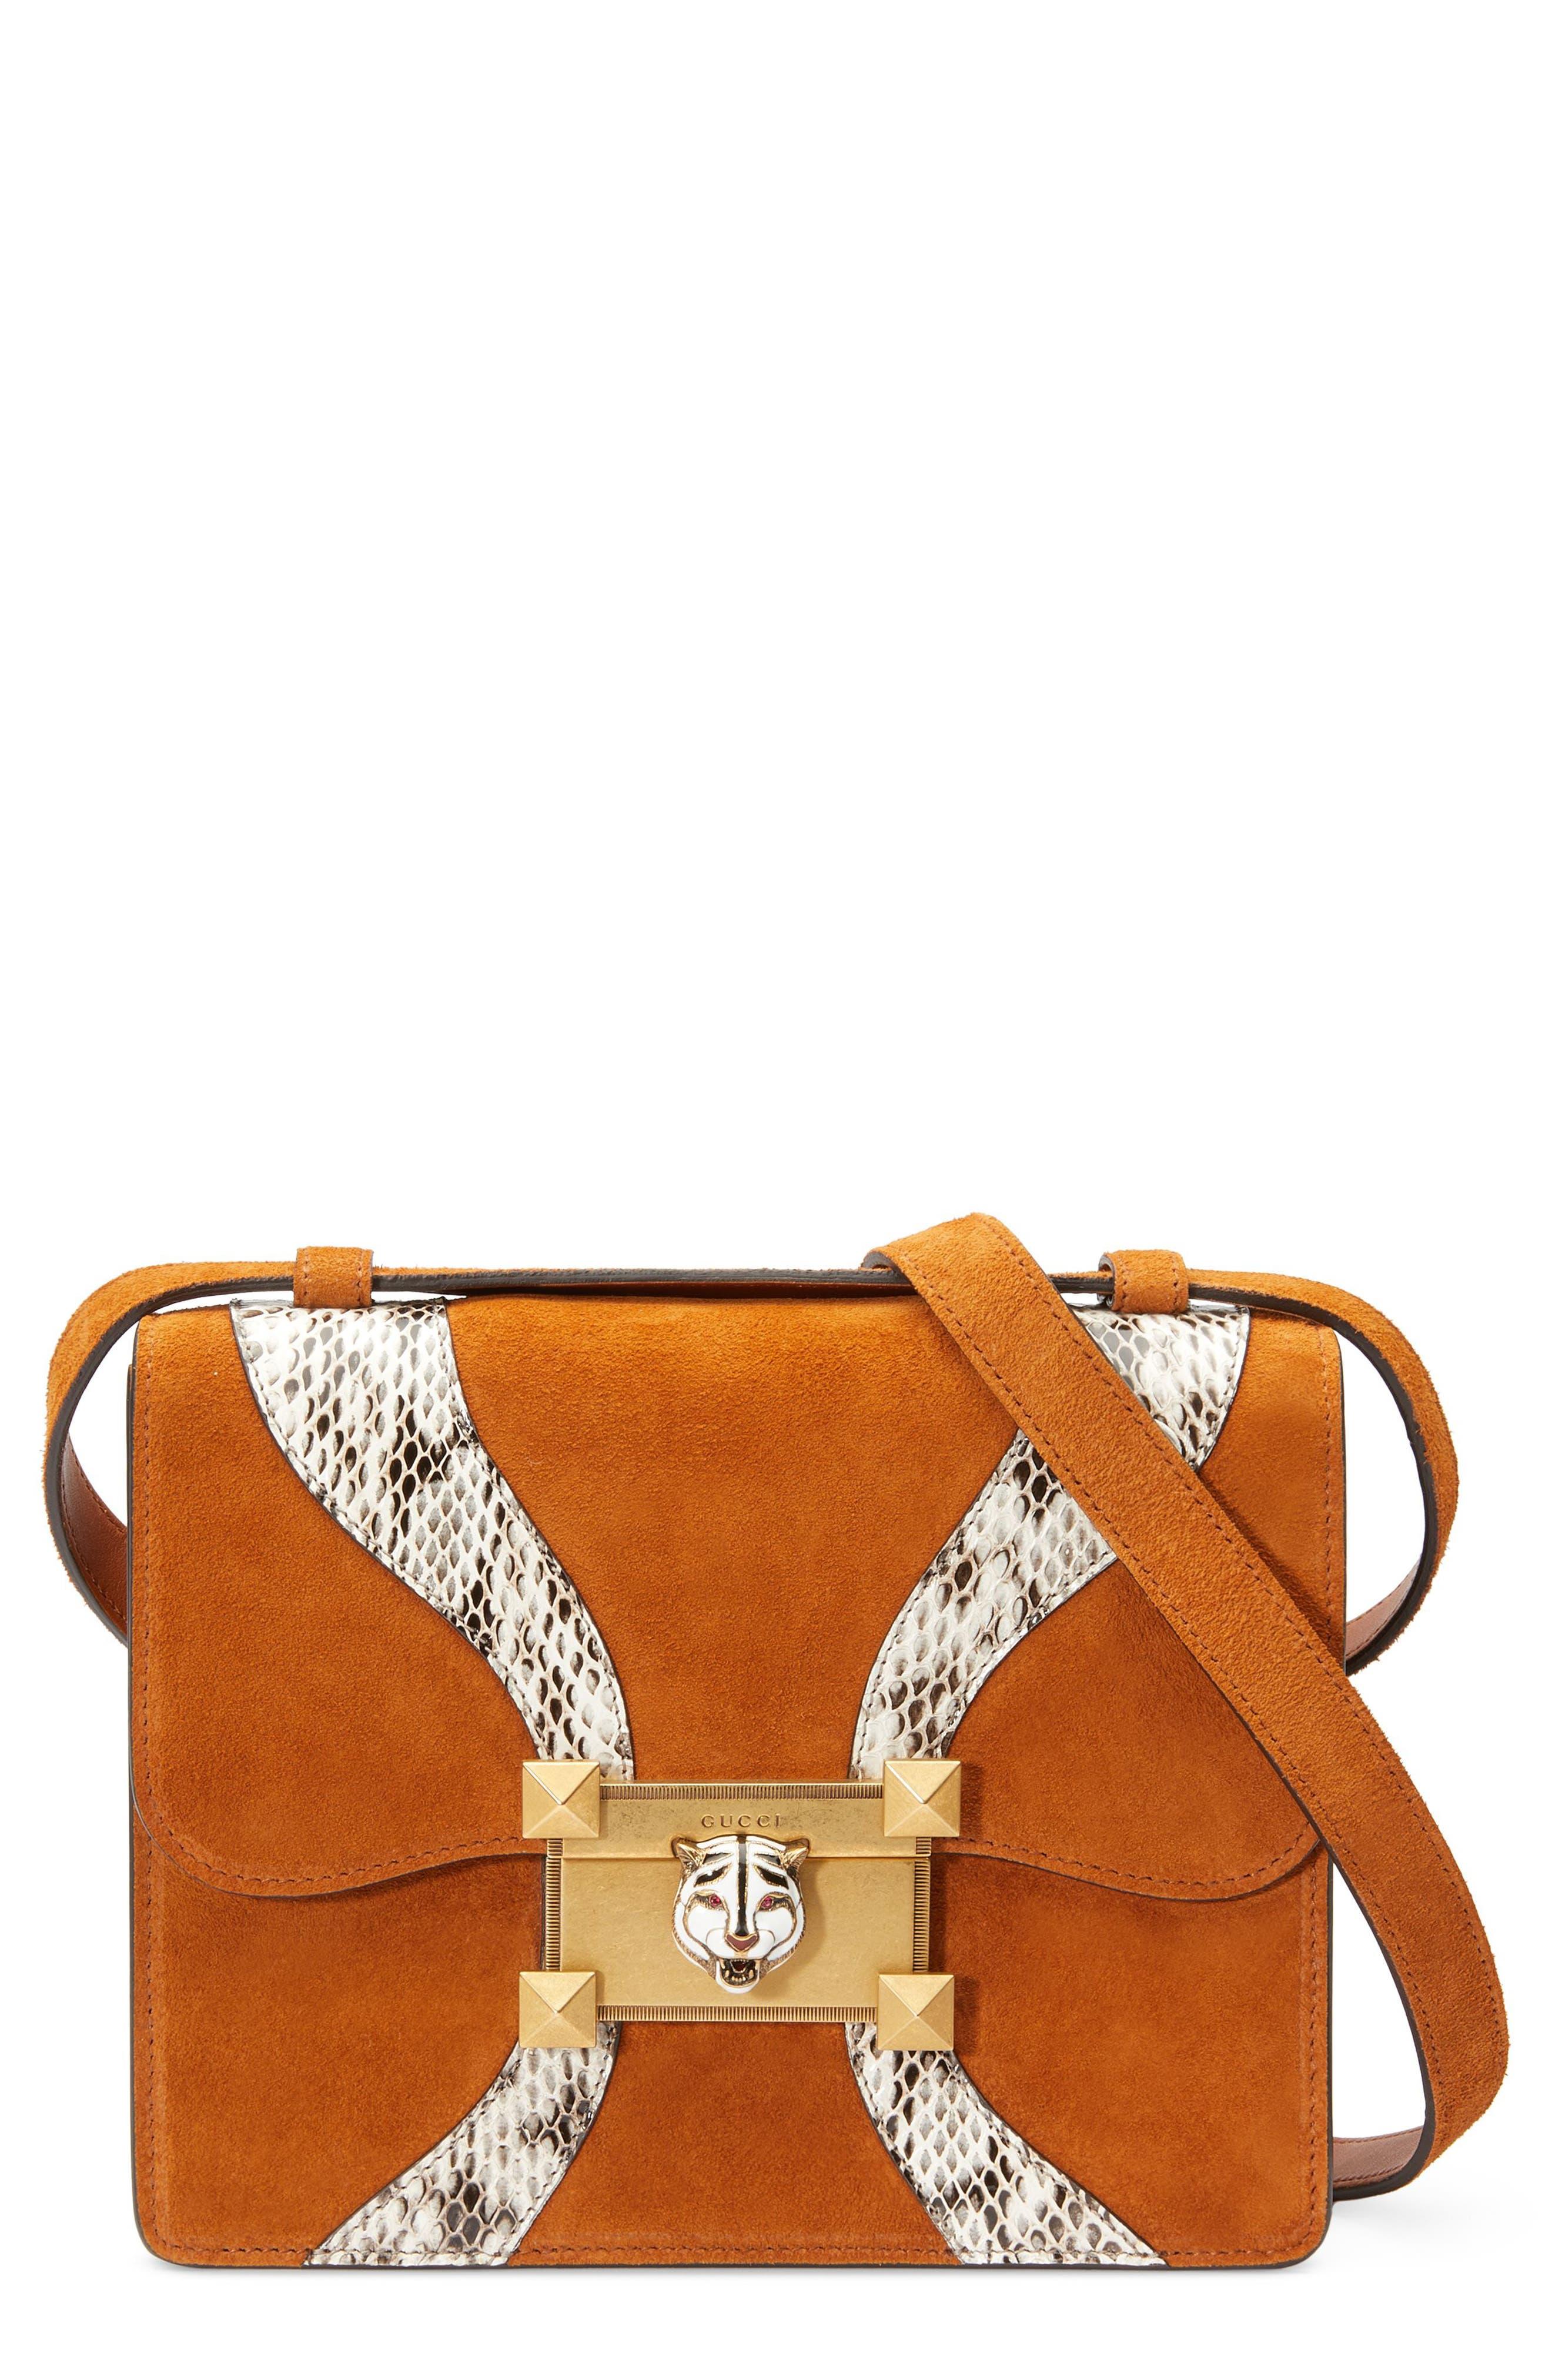 Osiride Suede & Genuine Snakeskin Shoulder Bag,                             Main thumbnail 1, color,                             Bright Cuir/ Roccia